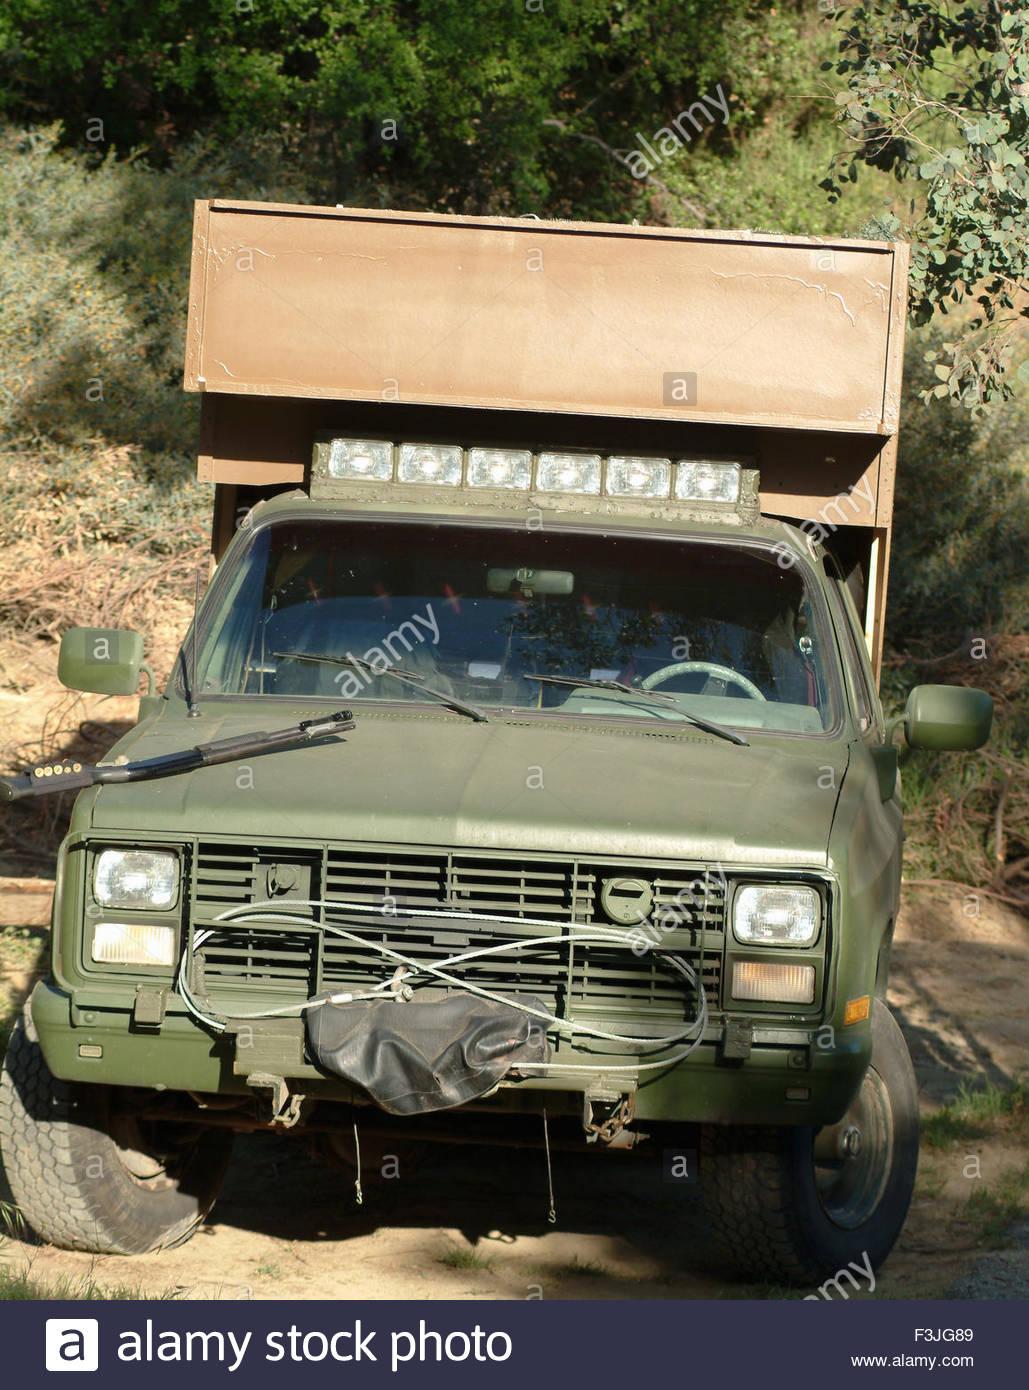 Military Chevy CUCV Utility Vehicle Stock Photo: 88303721 - Alamy